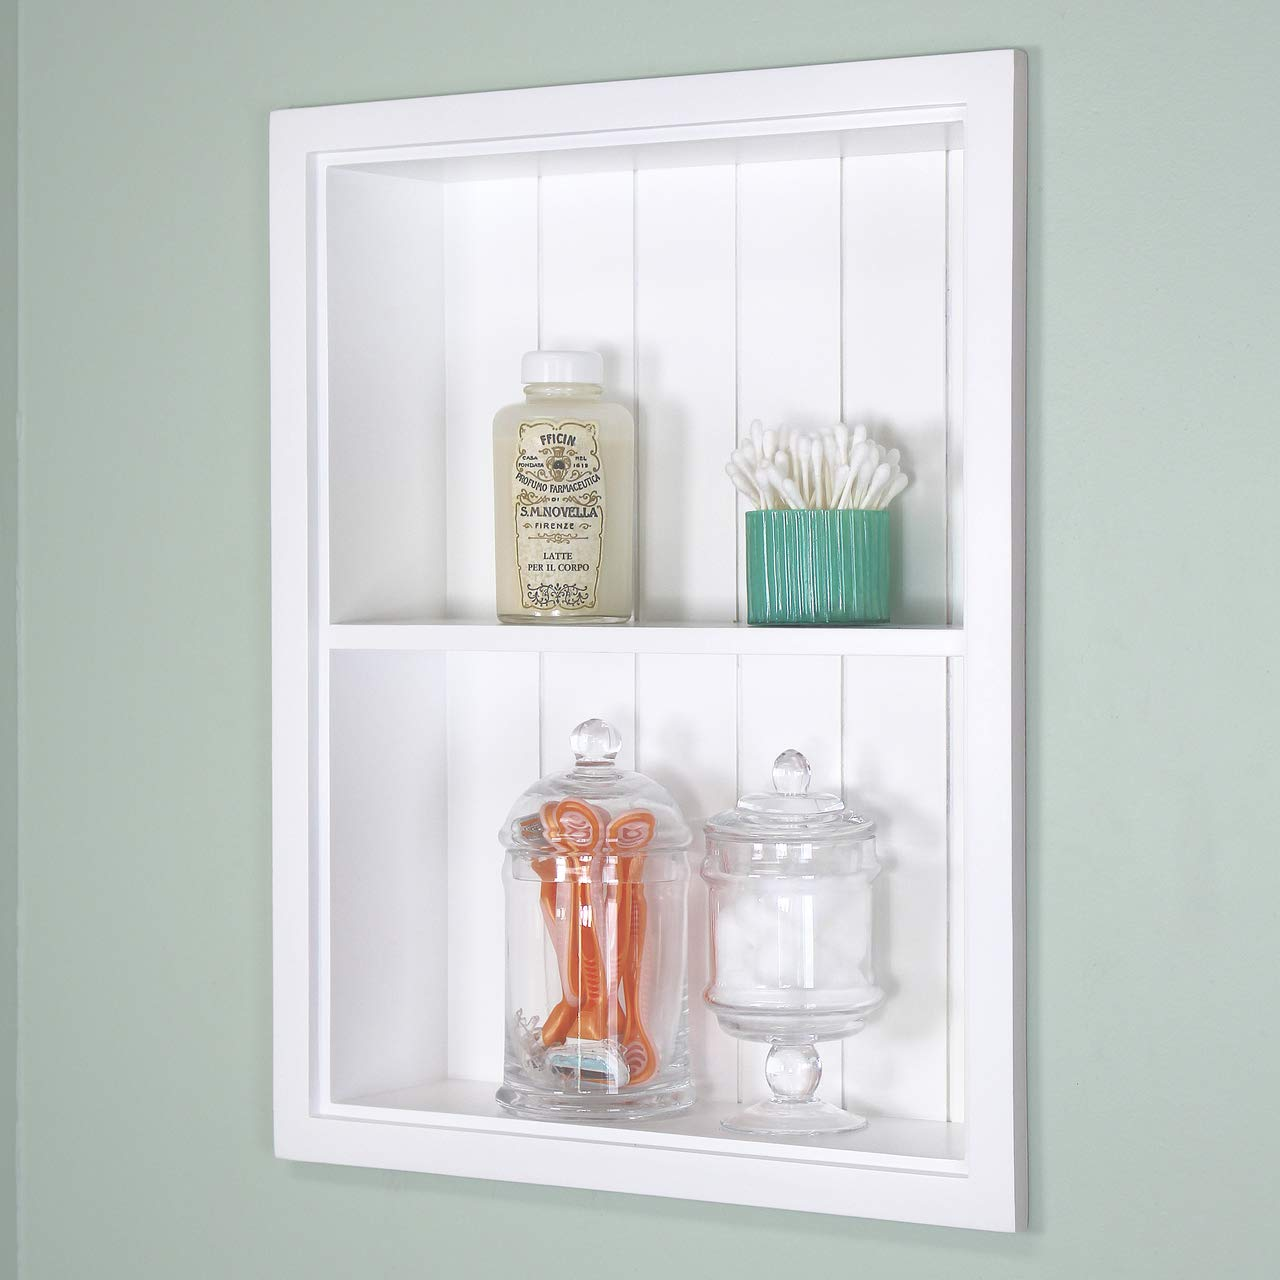 Fox Hollow Furnishings 14x18 Recessed White Sloane Wall Niche w/beadboard Back and 1 Shelf